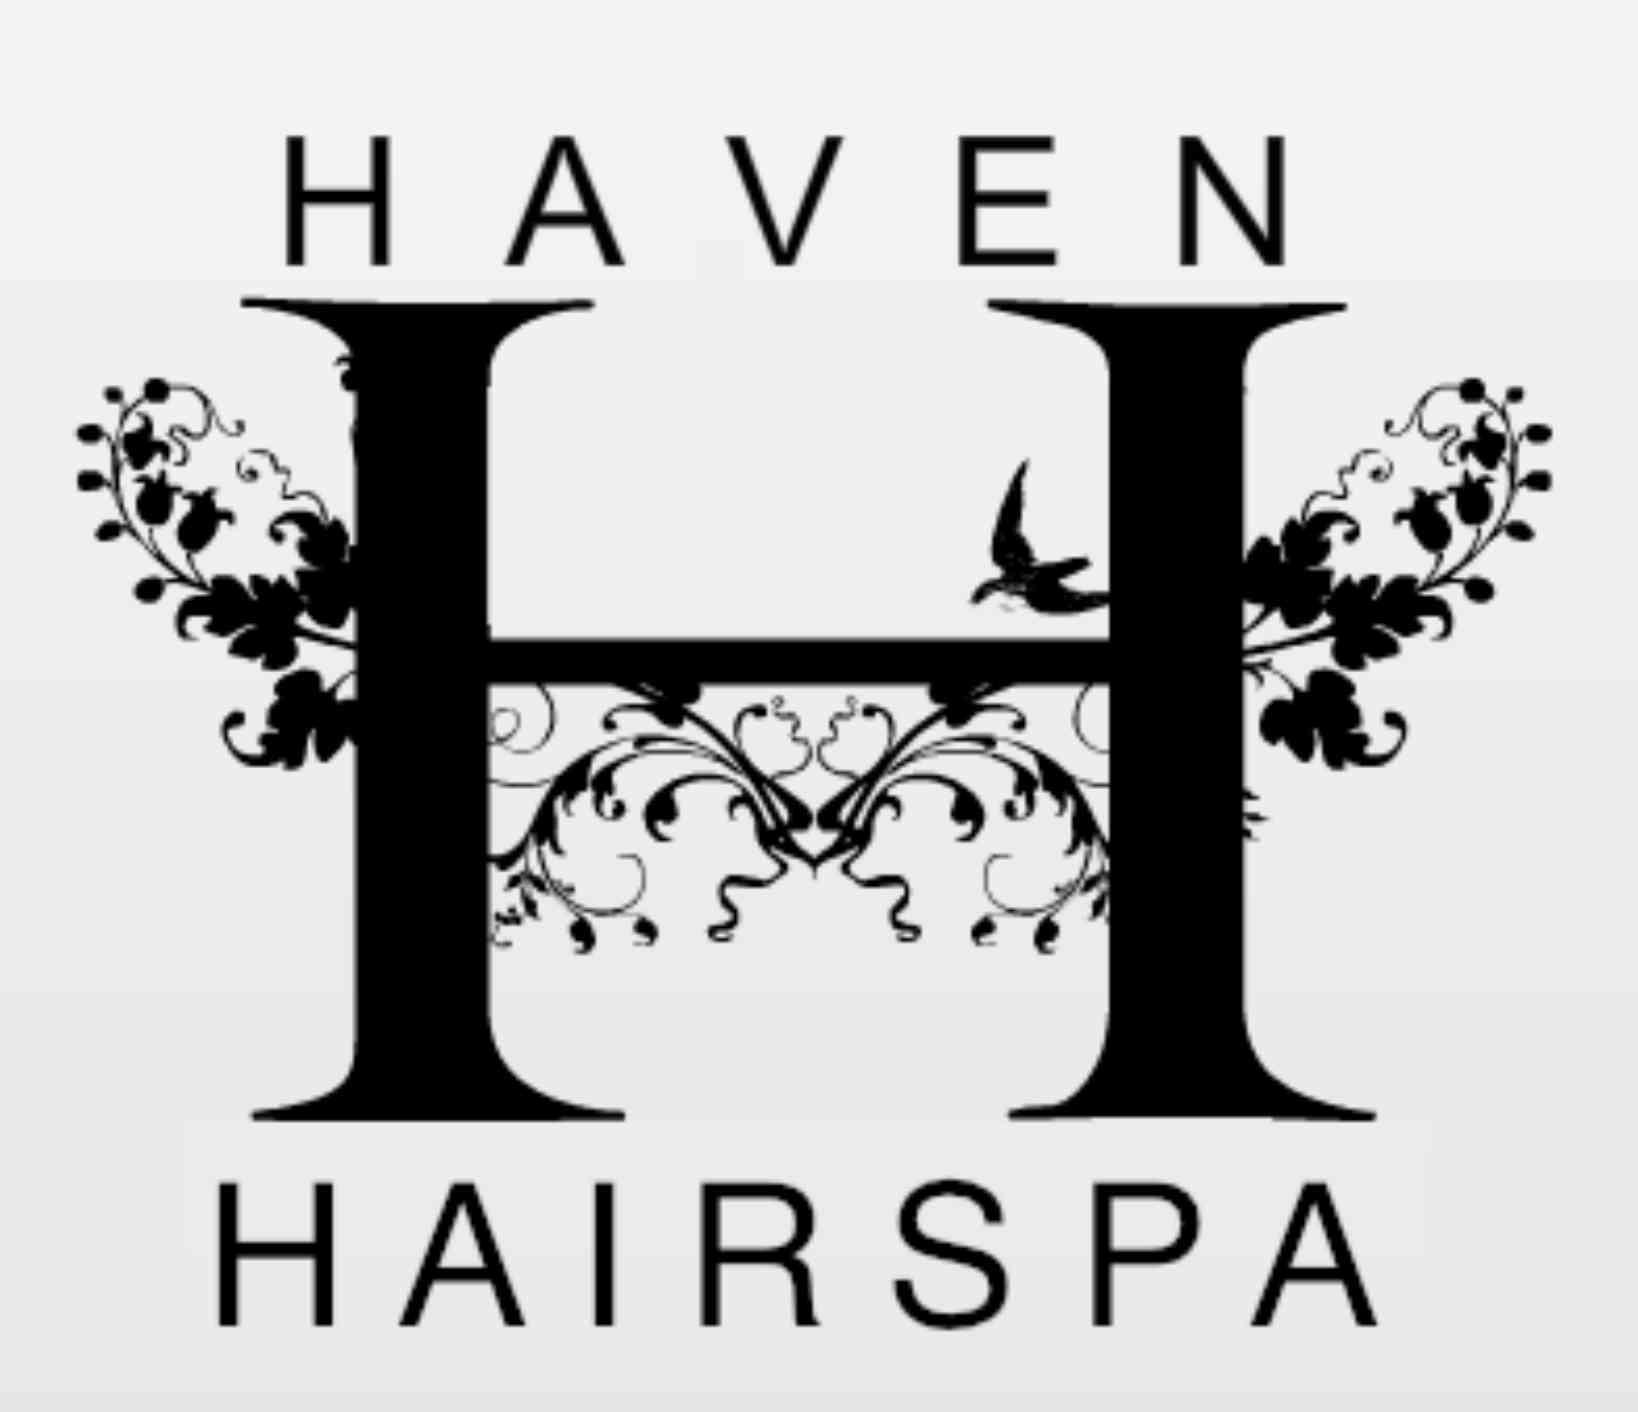 Haven clipart black and white Clipart Haven Panda haven%20clipart Clipart